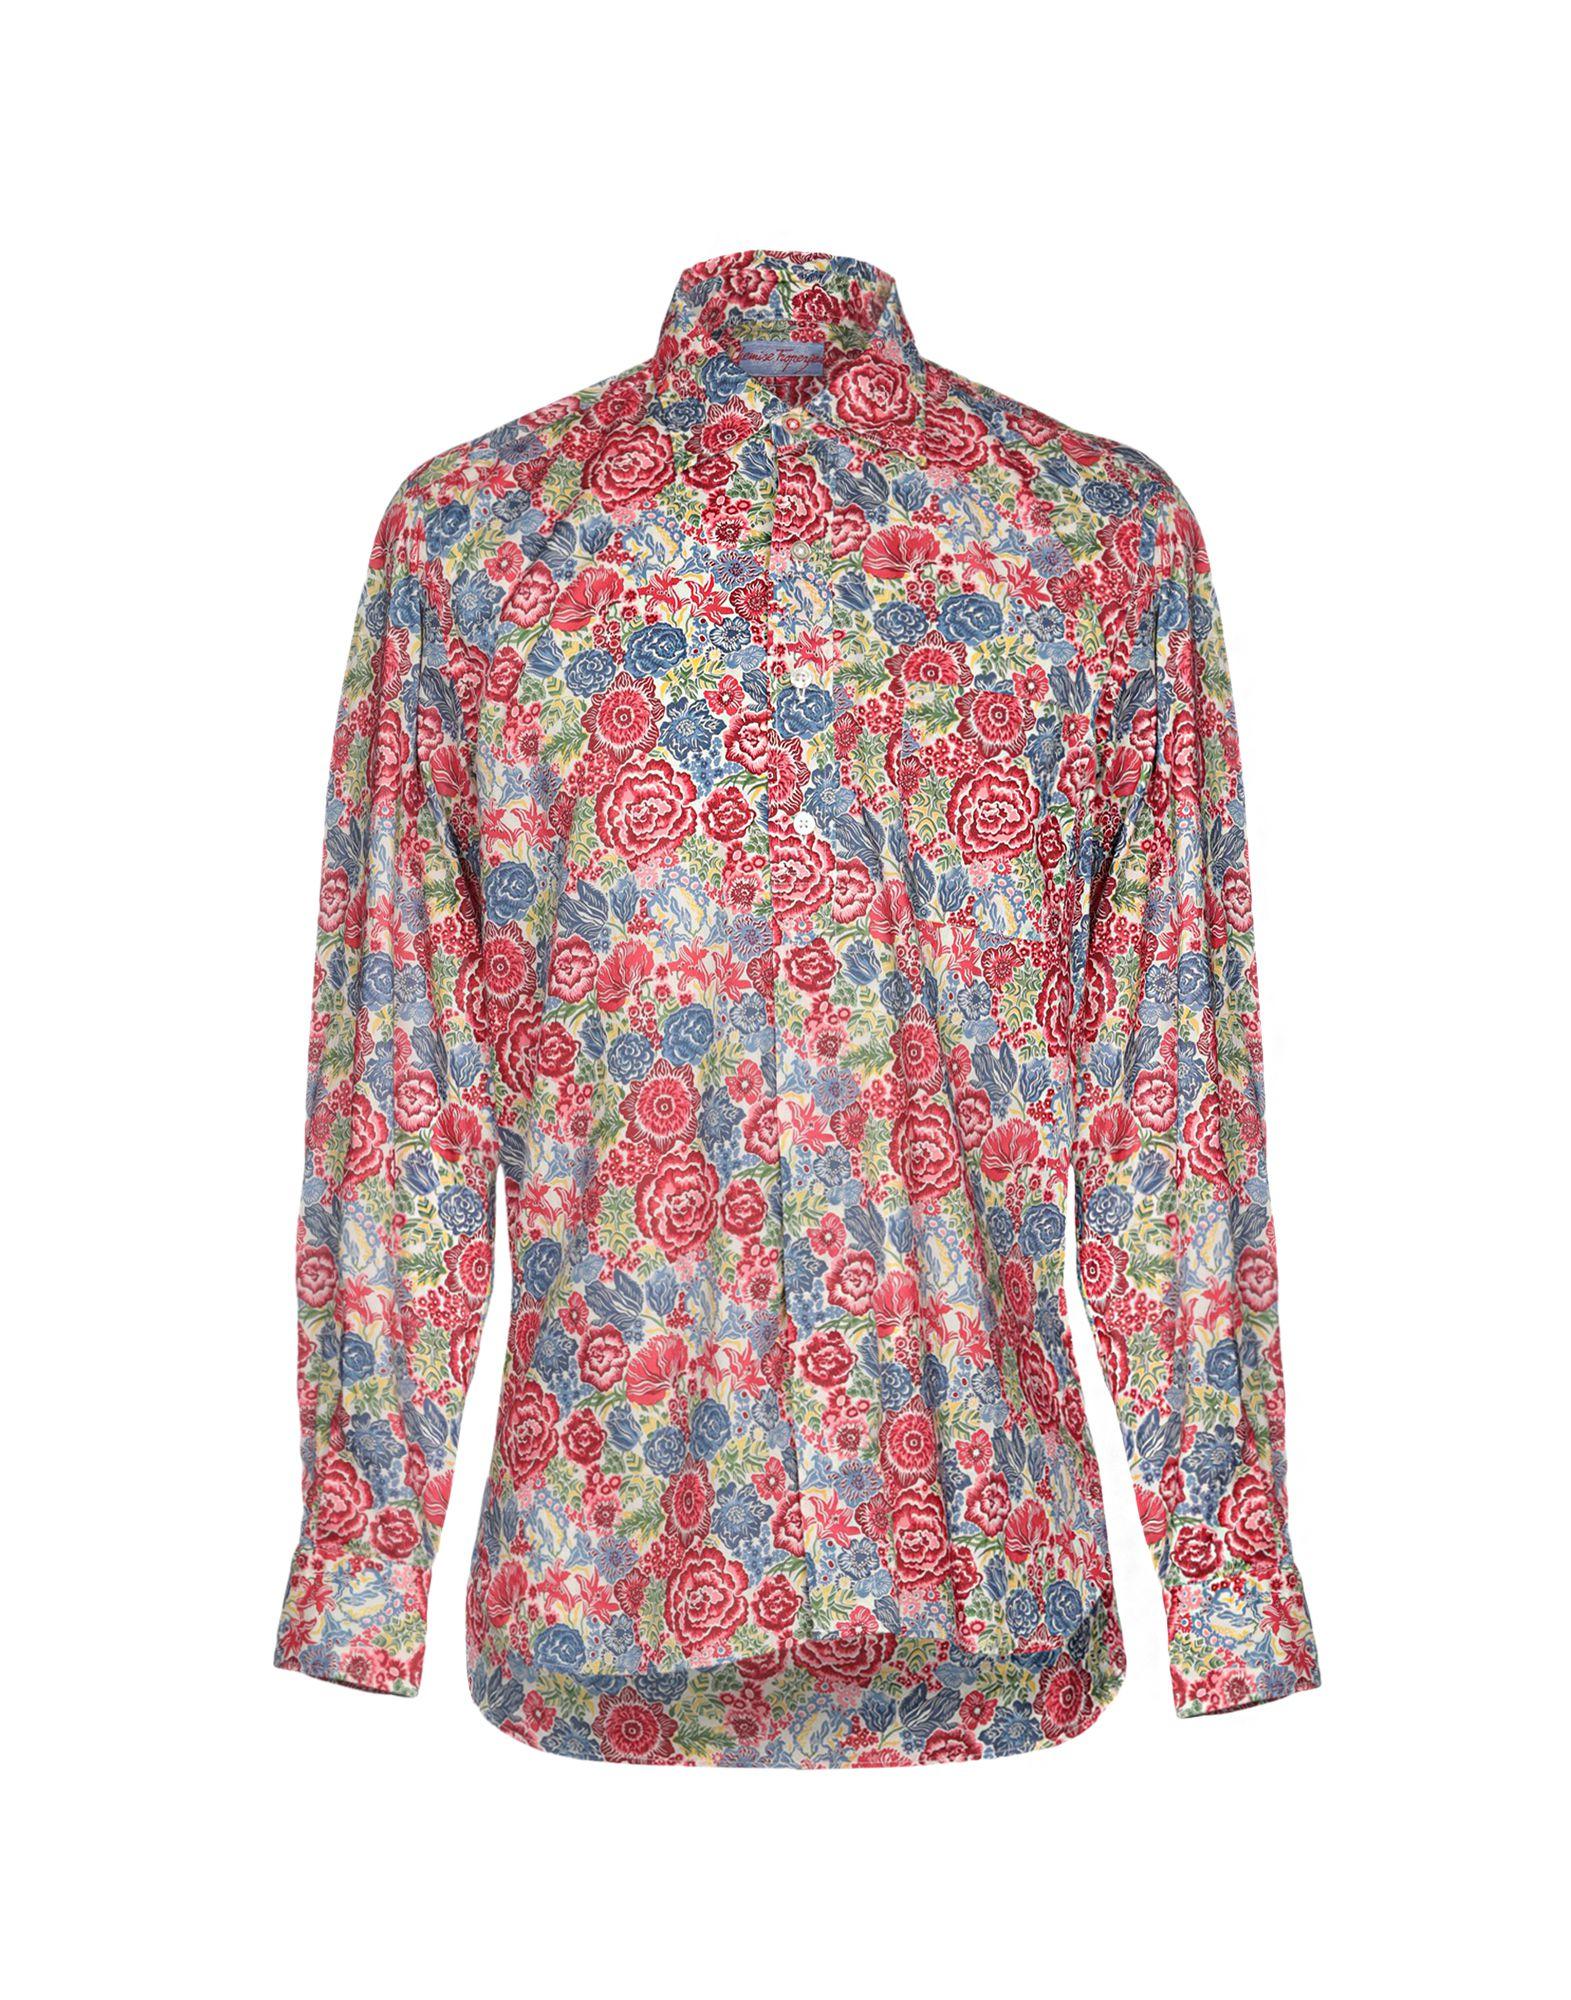 LA CHEMISE TROPÉZIENNE Pубашка jenni new pink solid ruffled chemise l $39 5 dbfl